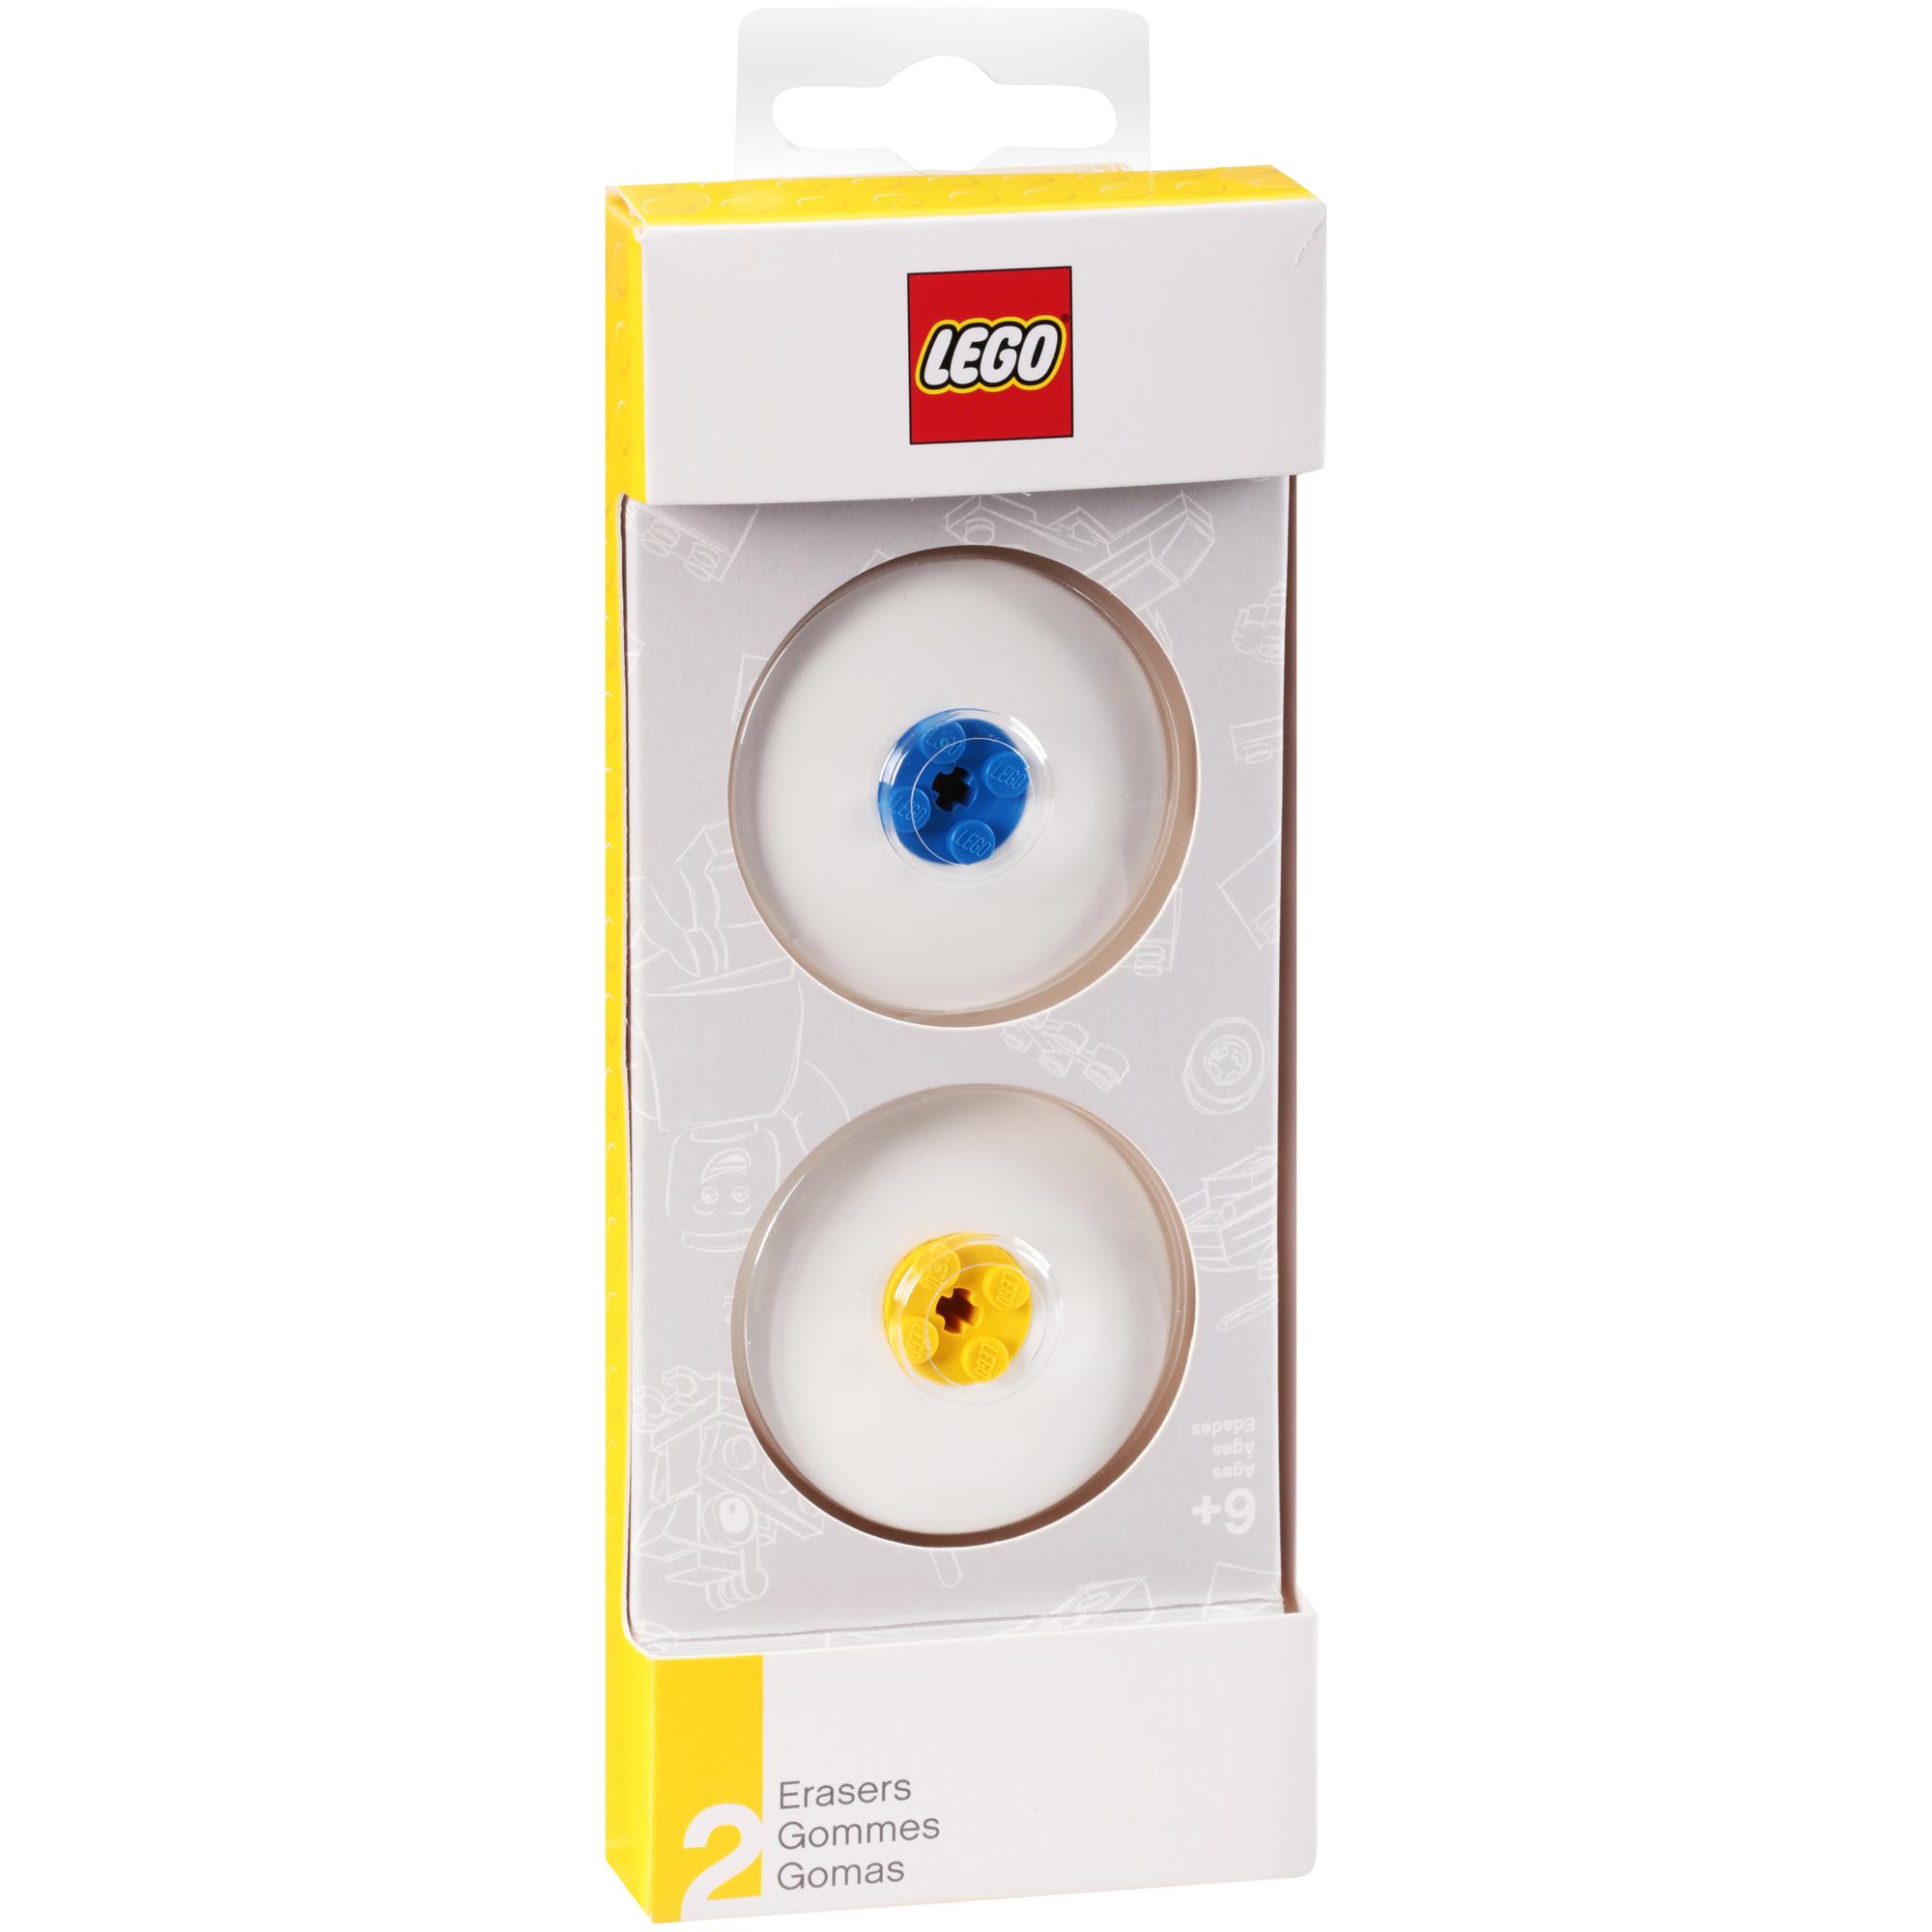 Lego Erasers 2 ct Pack by SANTOKI, LLC